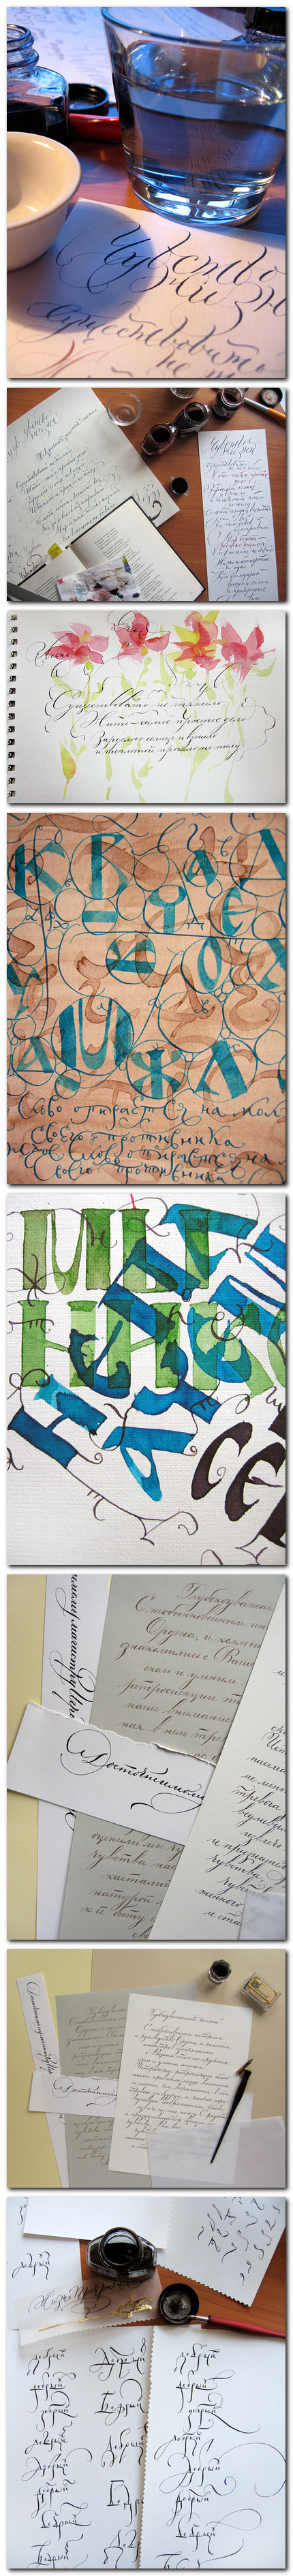 Lucrari caligrafice - Marina Marjina